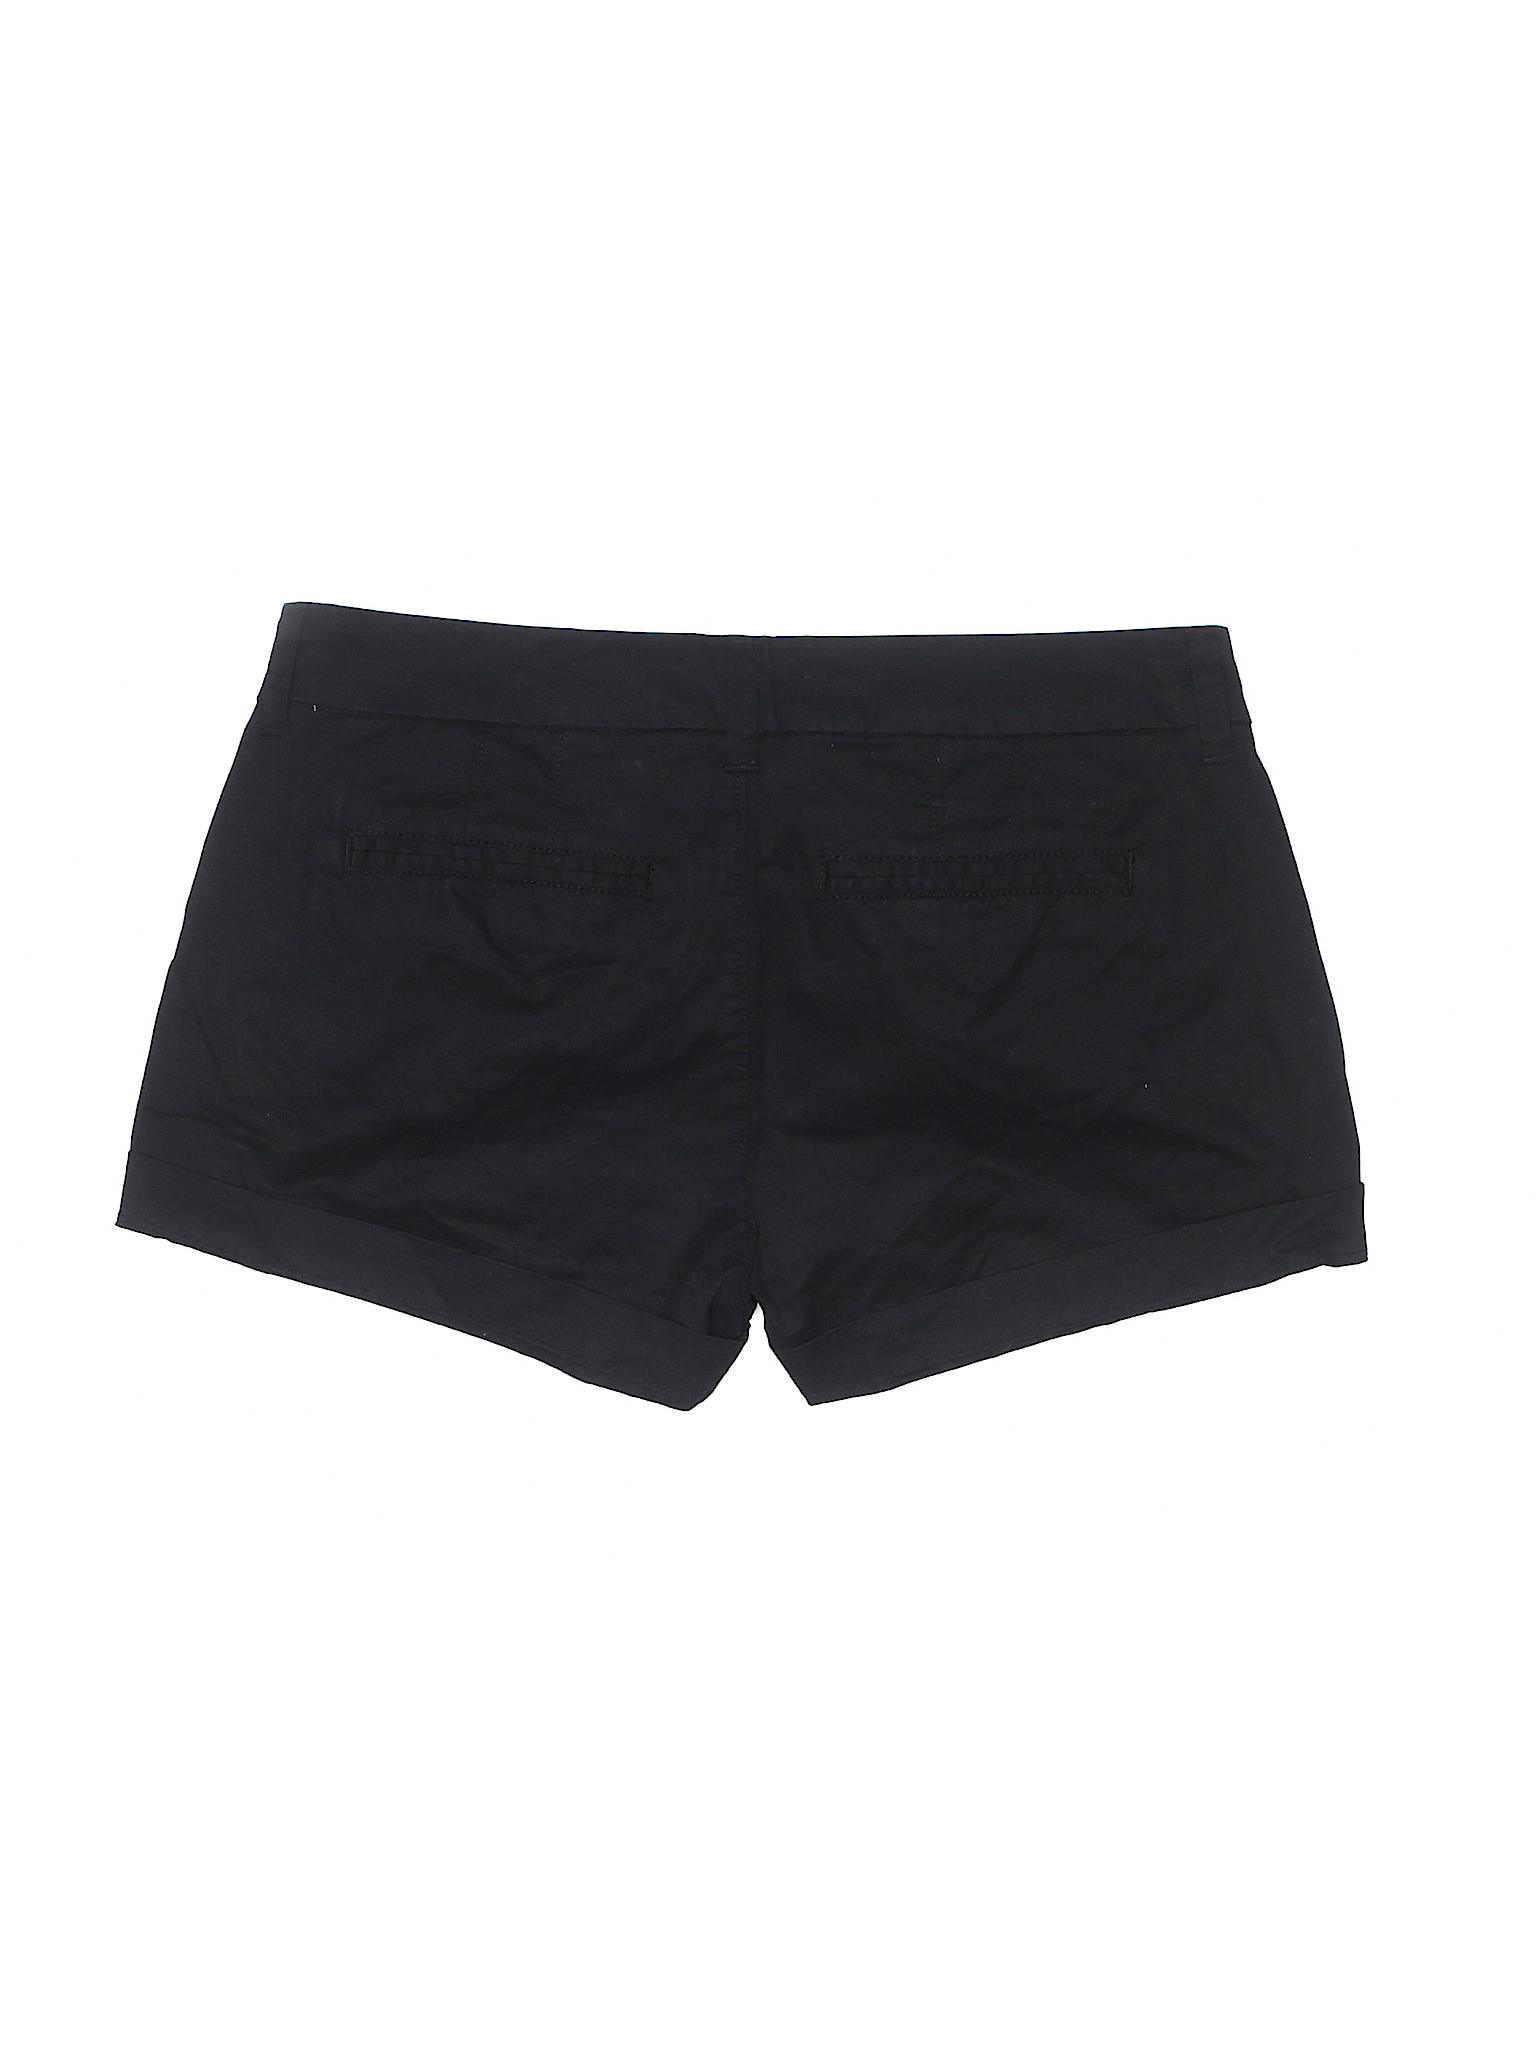 Khaki Navy Navy Old Boutique Shorts Old Shorts Khaki Boutique Old Boutique Bxd1qOCw